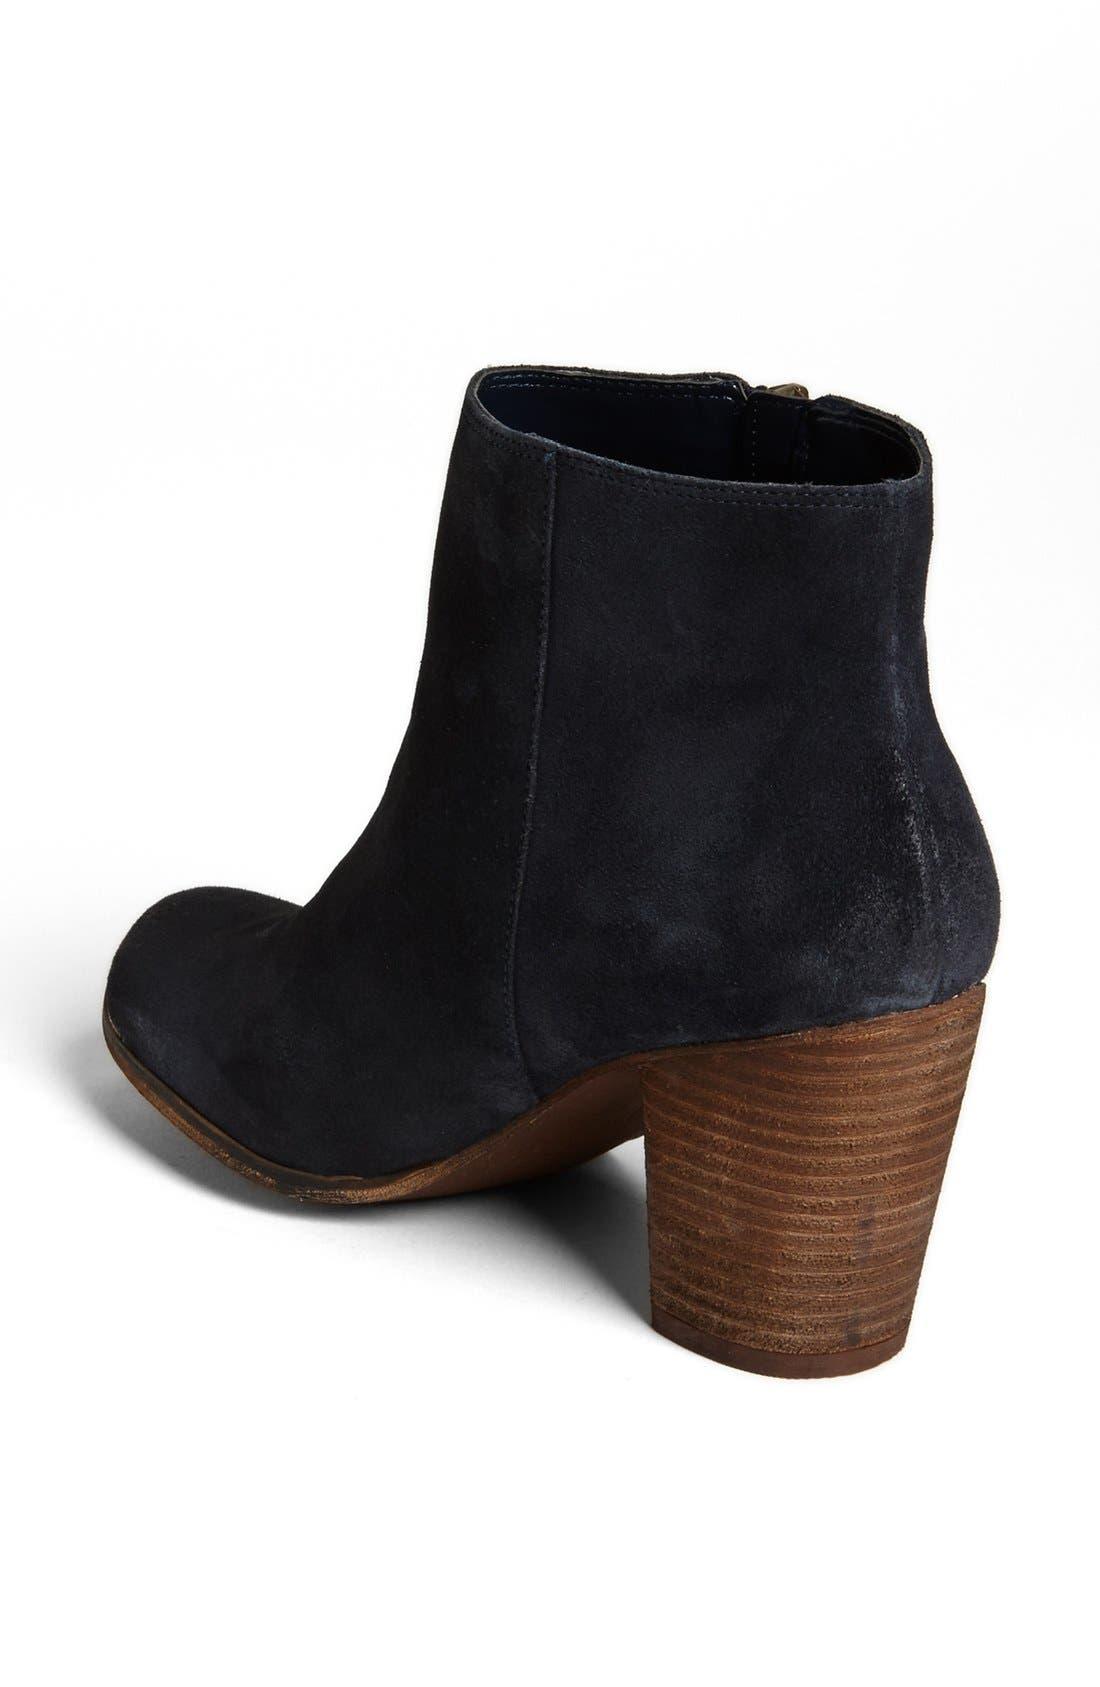 Alternate Image 2  - BP. 'Trolley' Suede Ankle Boot (Women)